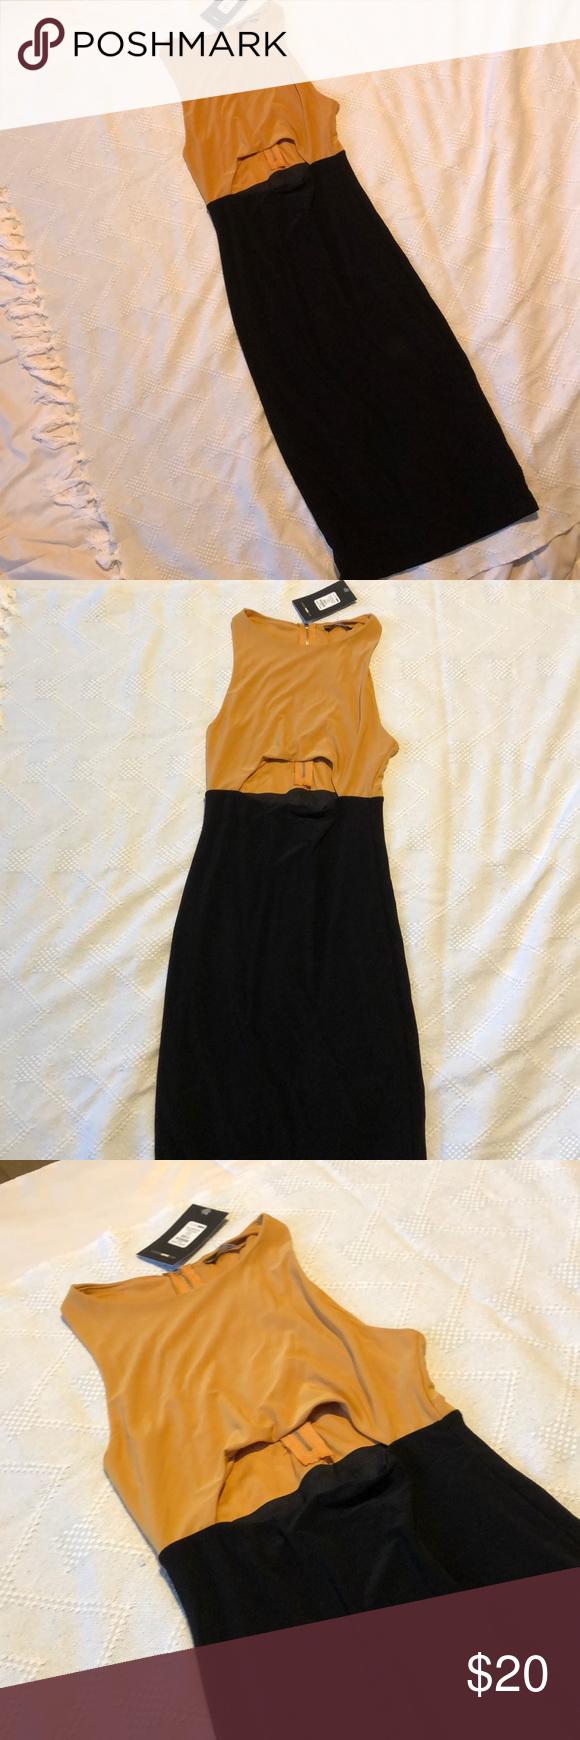 BNWT Fashion nova dress Brand new with tags fashion nova dress Not unfaithful bu…